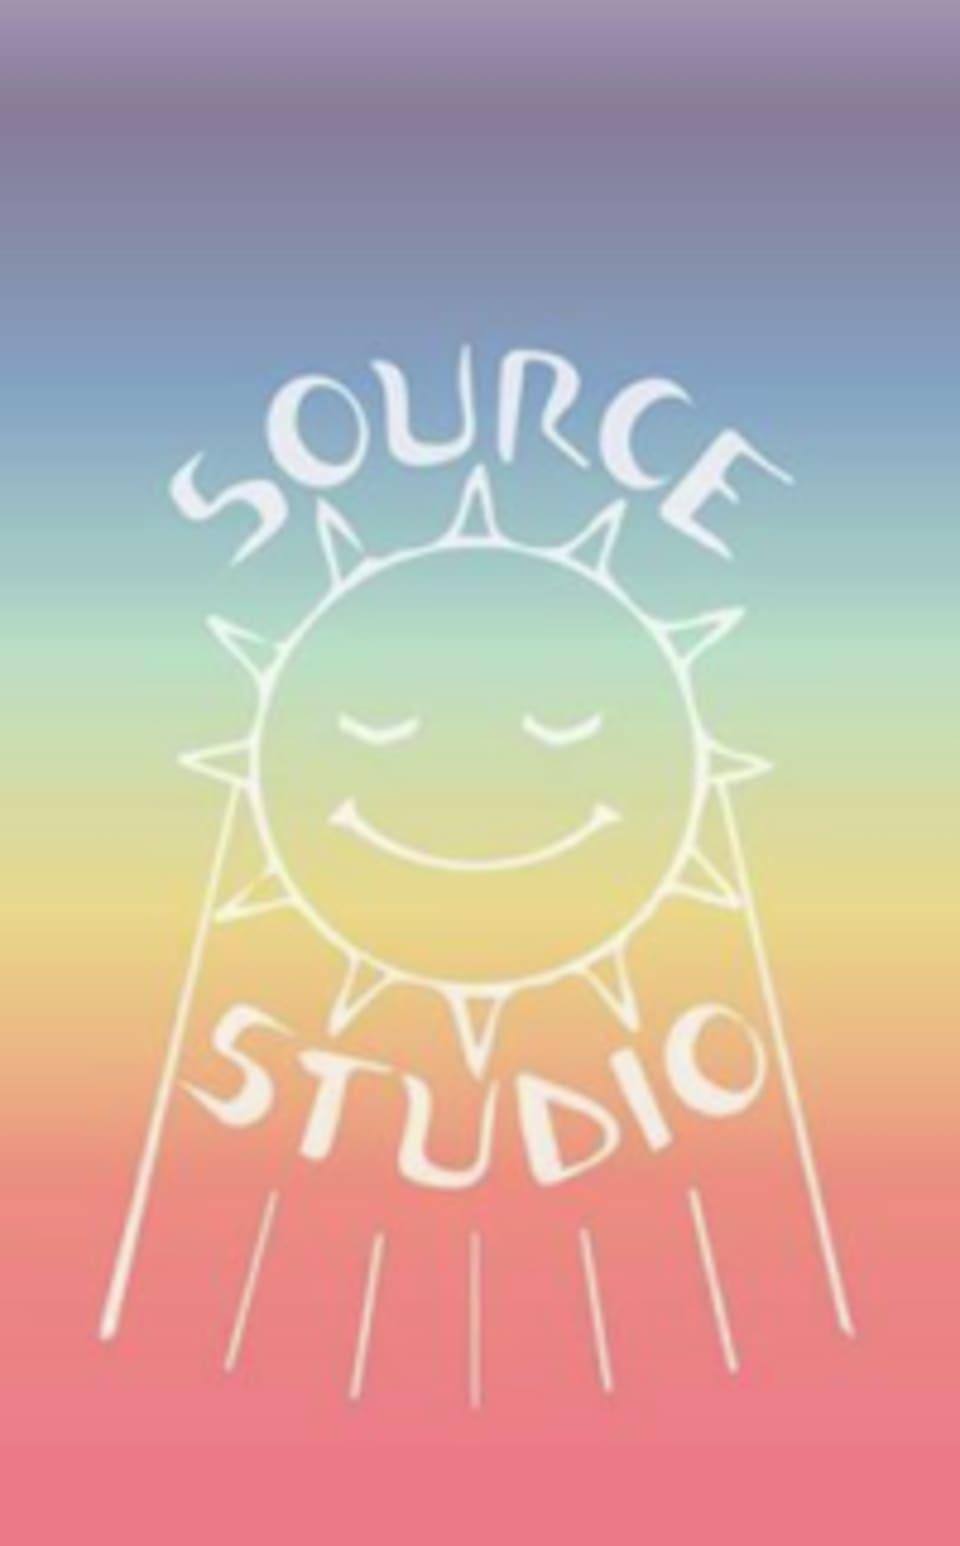 Source Studio logo